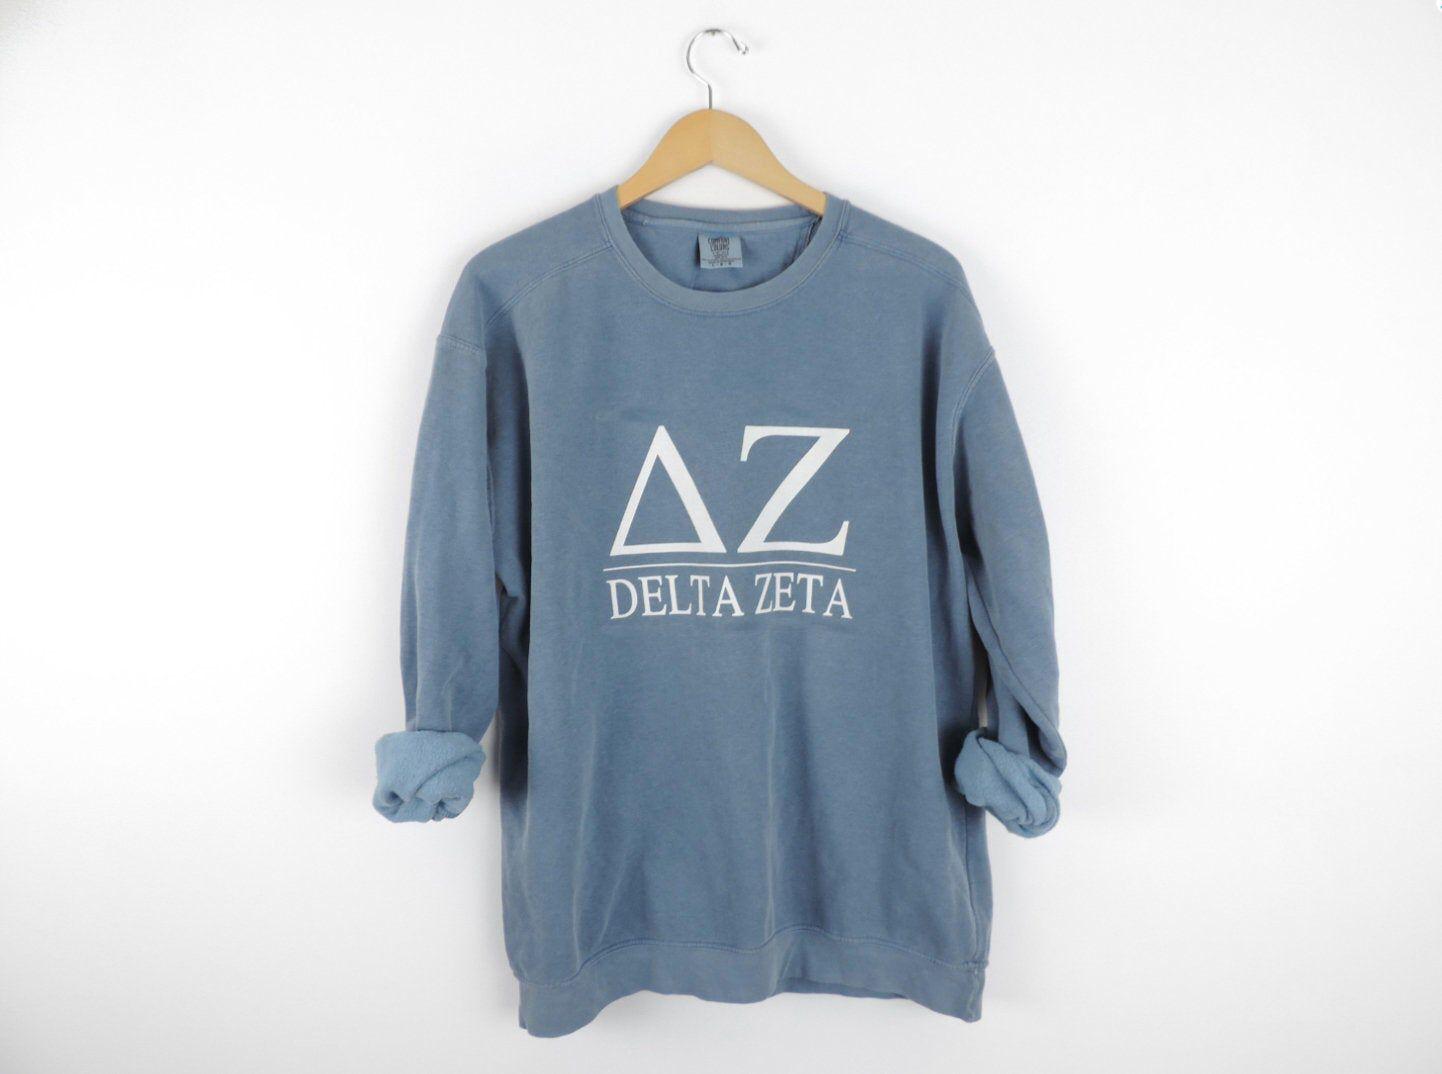 New Delta Zeta Comfort Colors Stripe Crewneck Sweatshirt Size